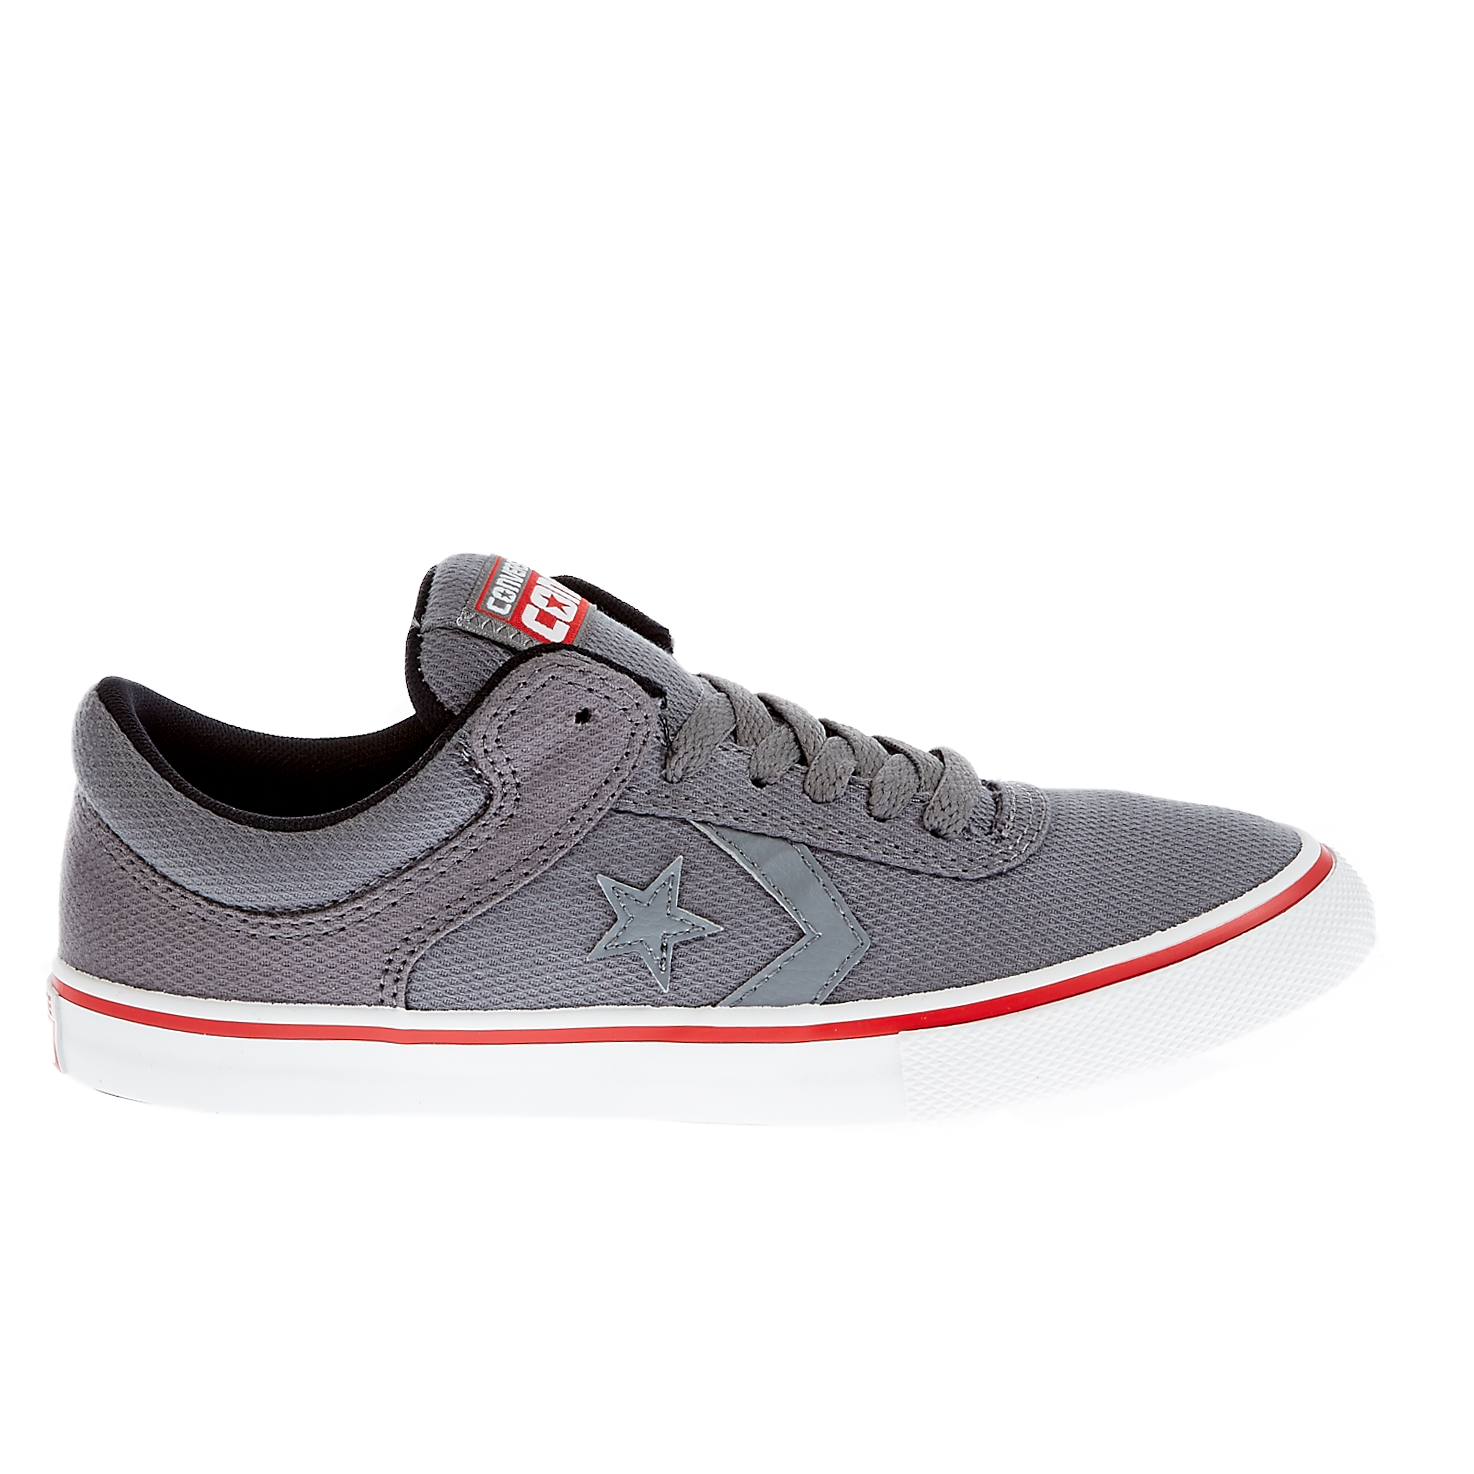 CONVERSE – Παιδικά παπούτσια Aero S γκρι